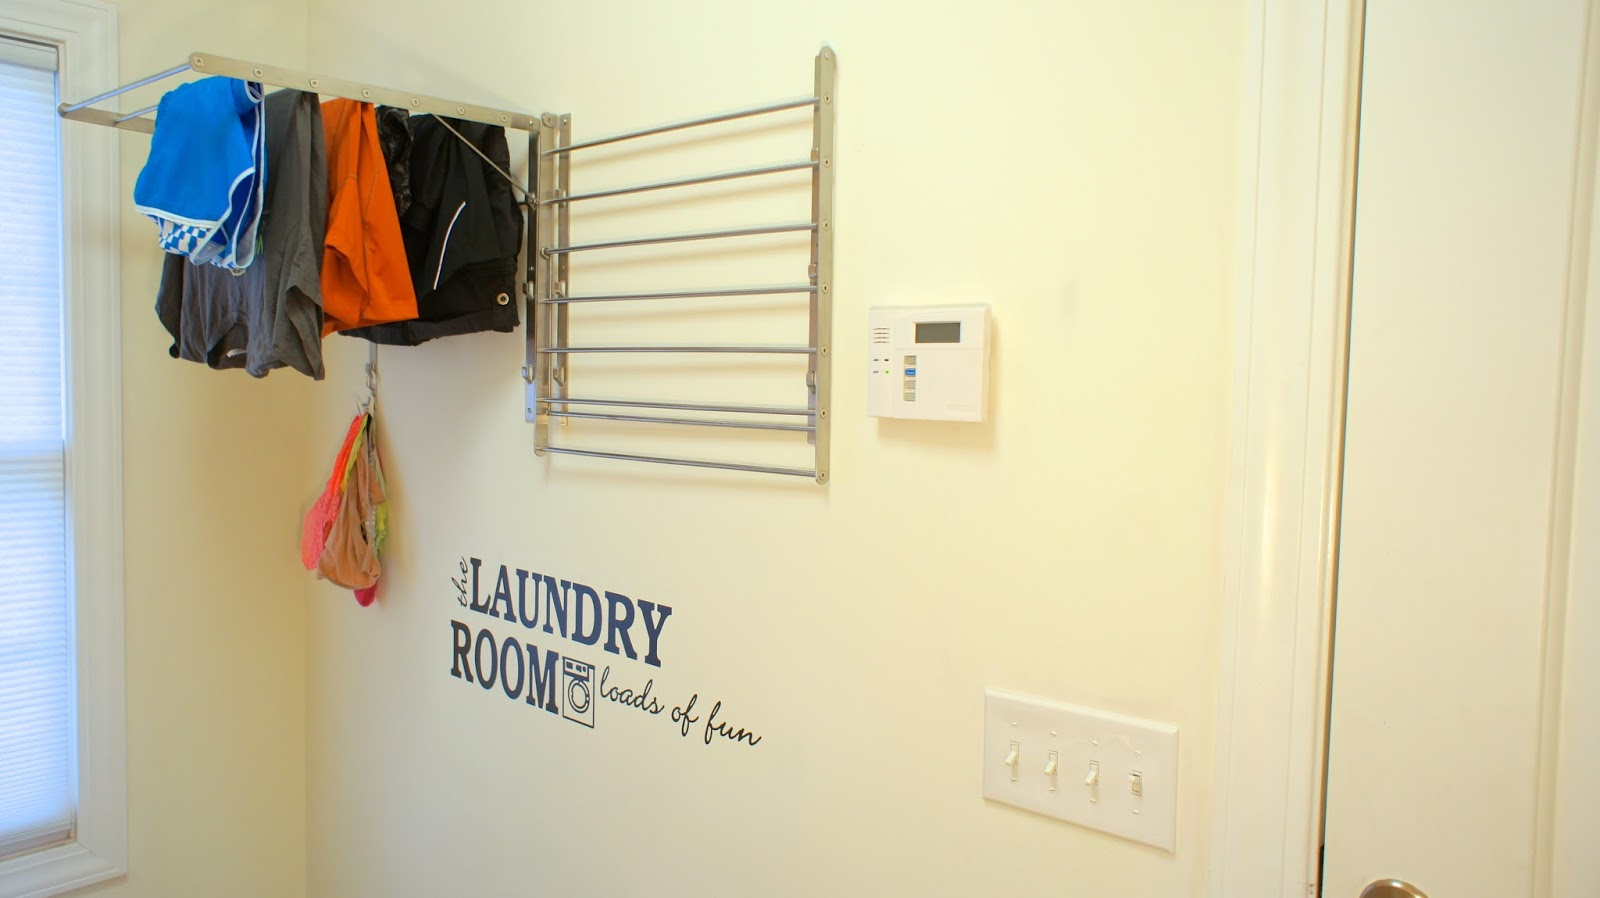 Food. Fashion. Home.: Laundry Room Refresh - Part 1